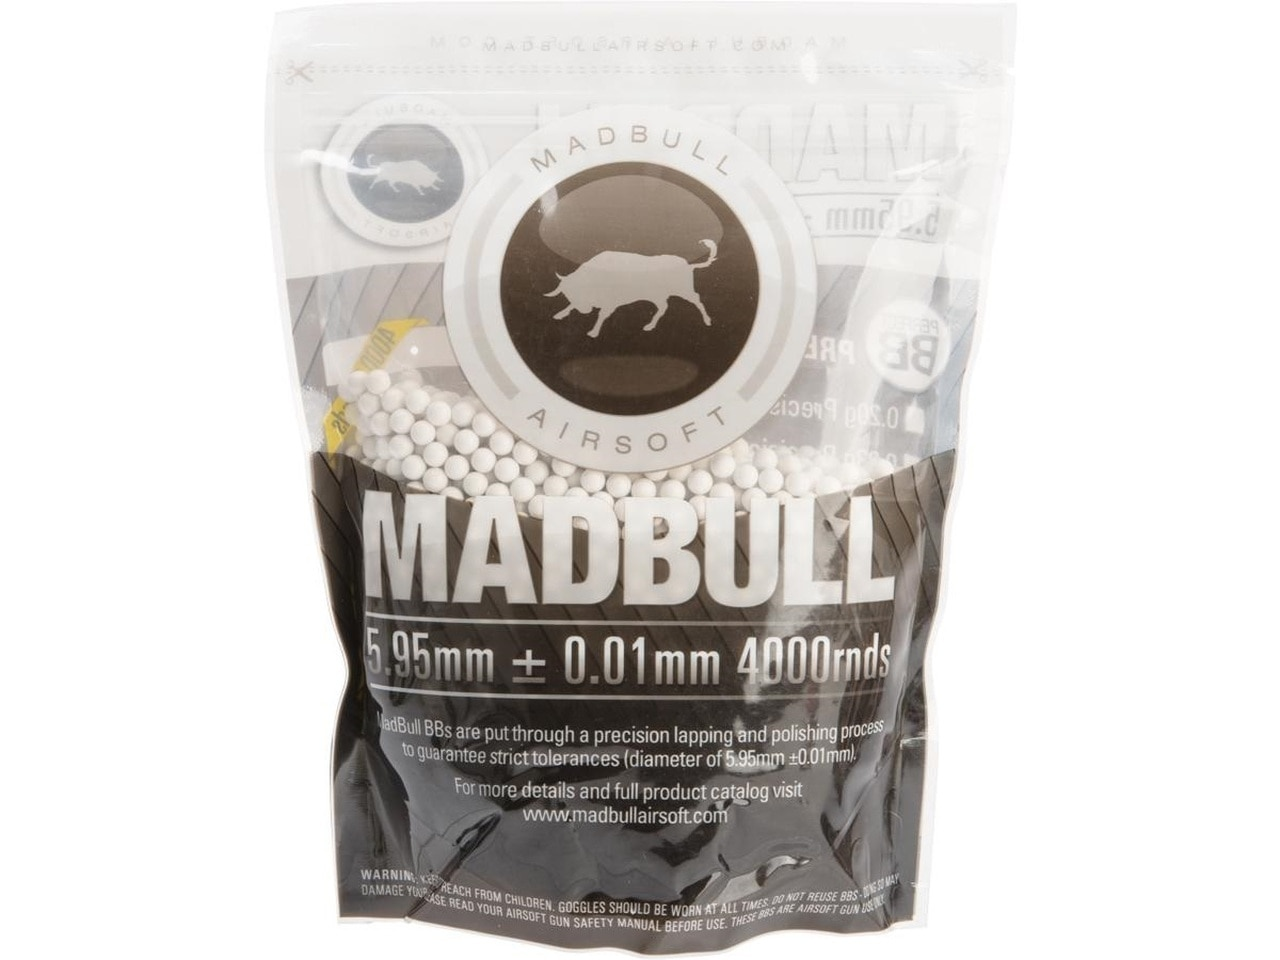 Madbull Premium Match Grade 6mm PLA Biodegradable Airsoft BB (.28g White / 4000rd Bag)